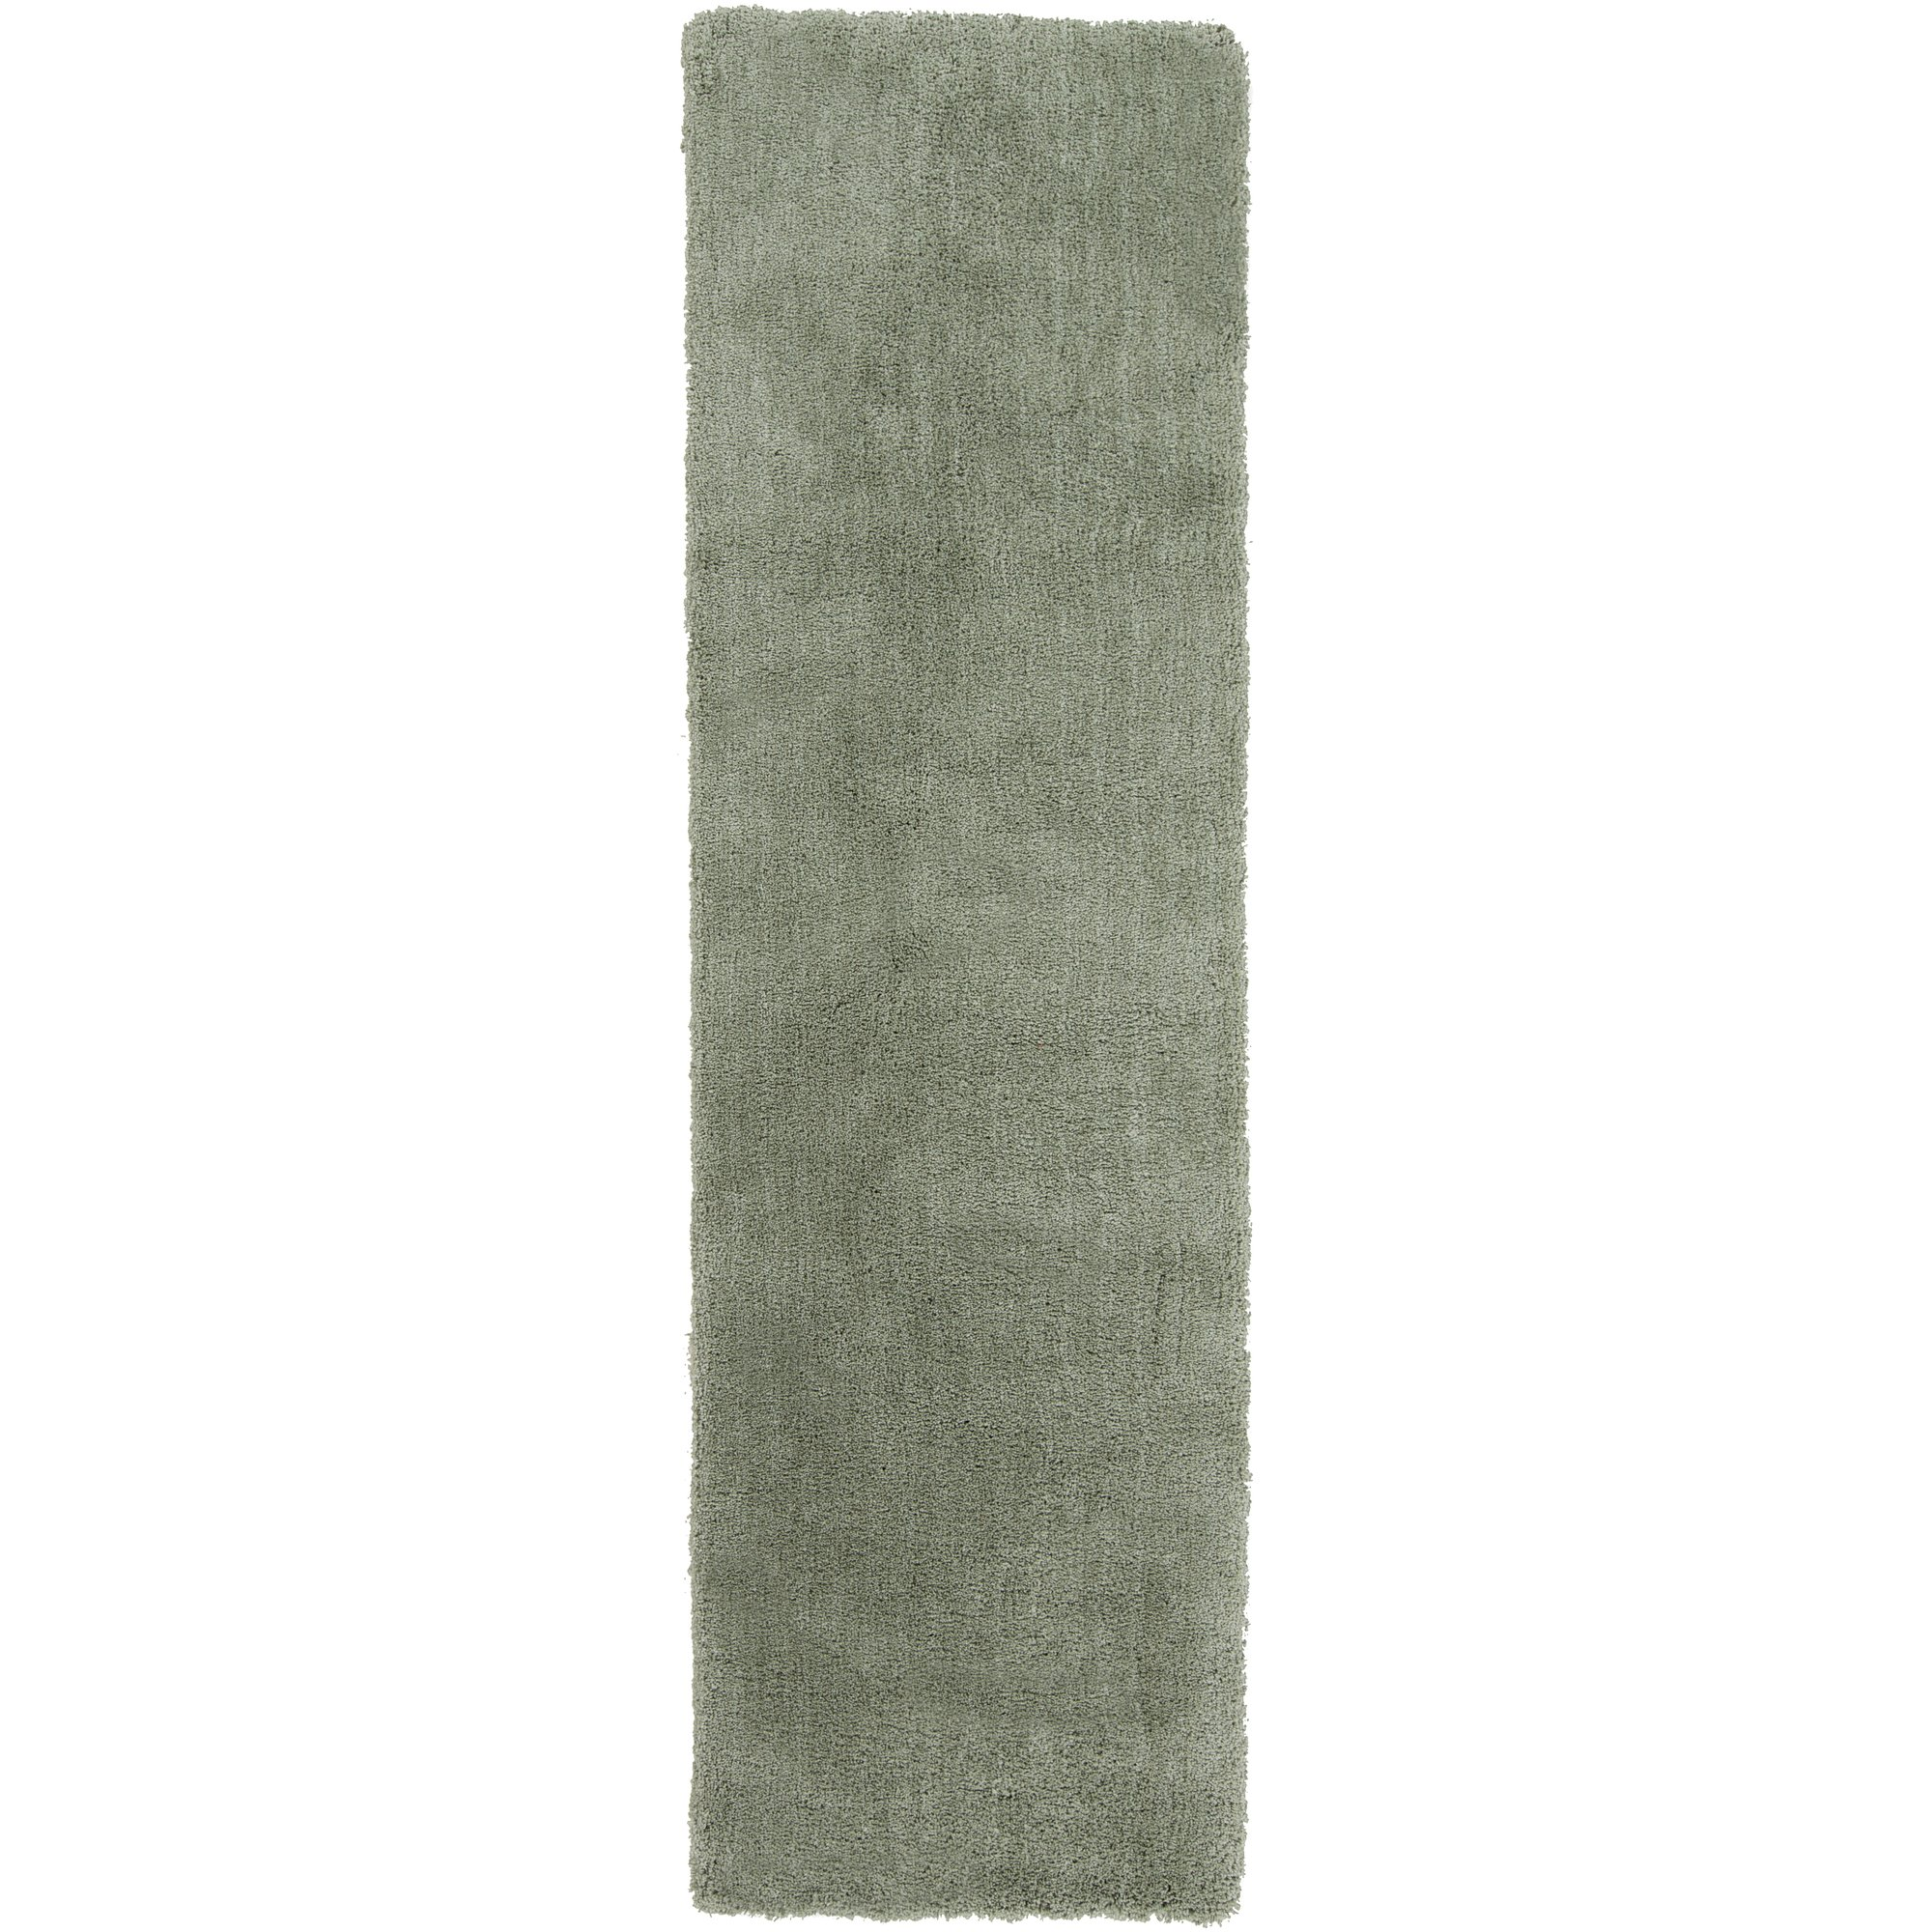 Surya Heaven HEA-8007 Shag Hand Woven 100% Polyester Malachite Green 2'3'' x 8' Runner